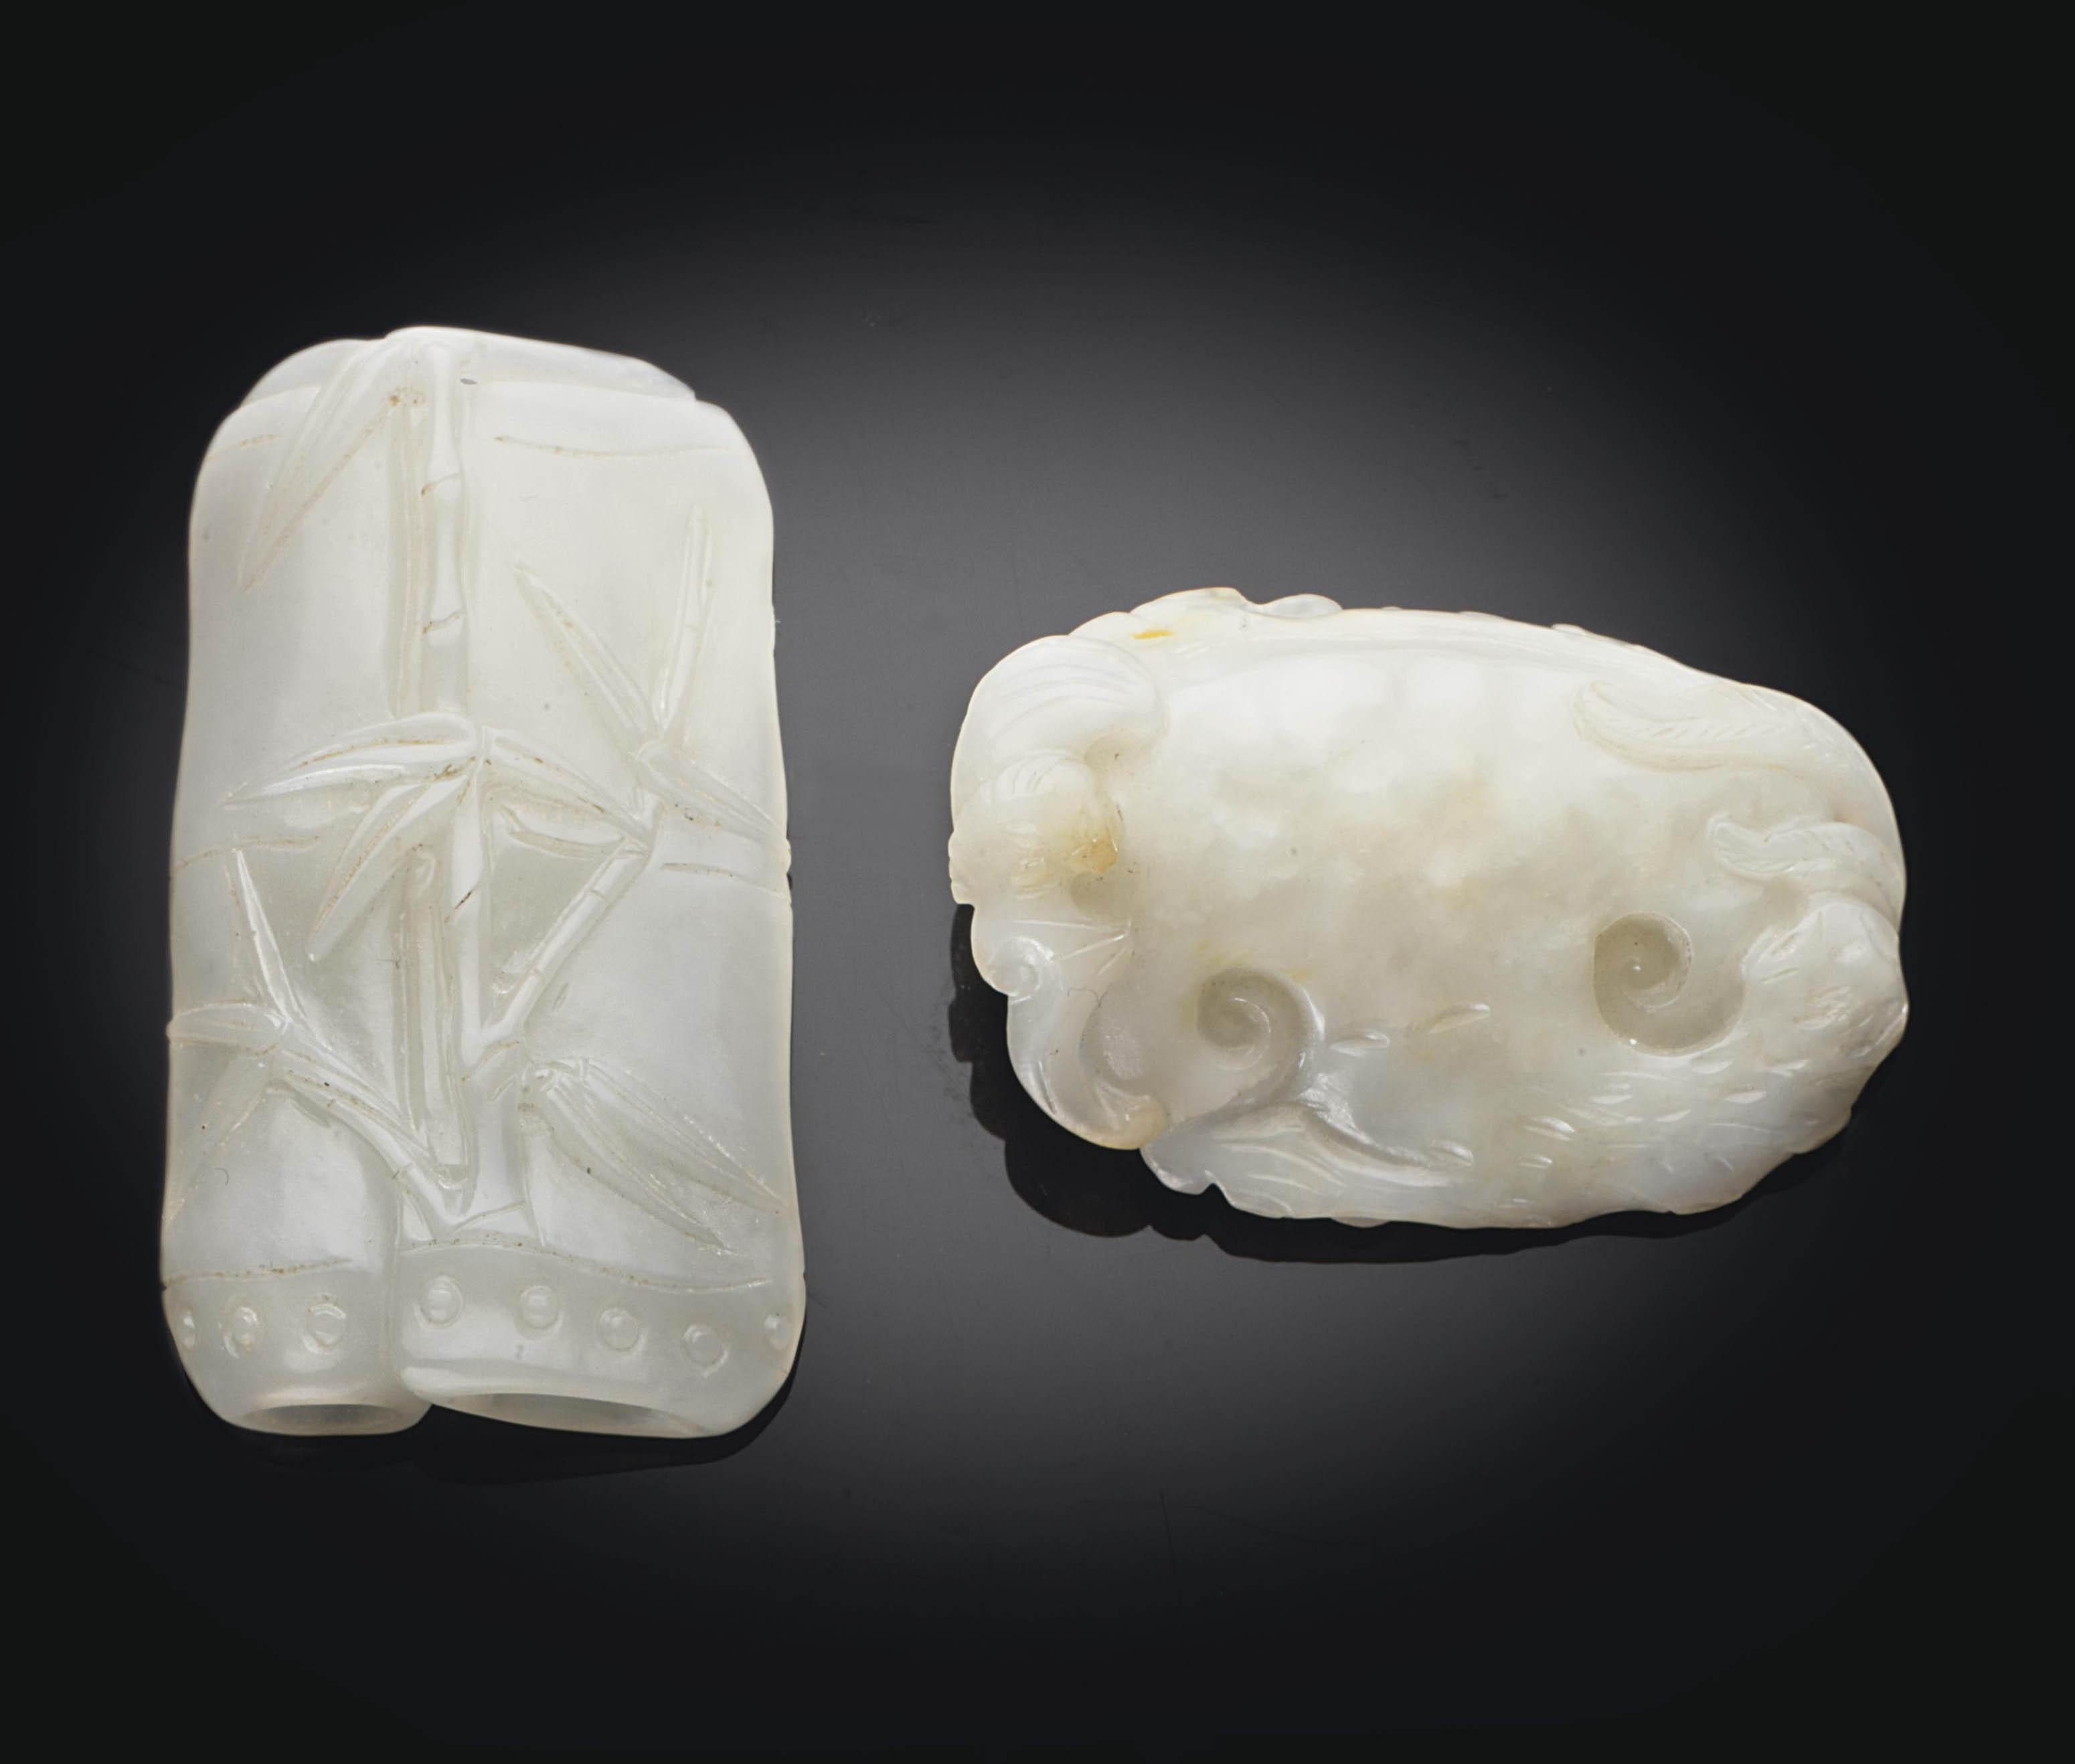 TWO WHITE JADE PENDANTS